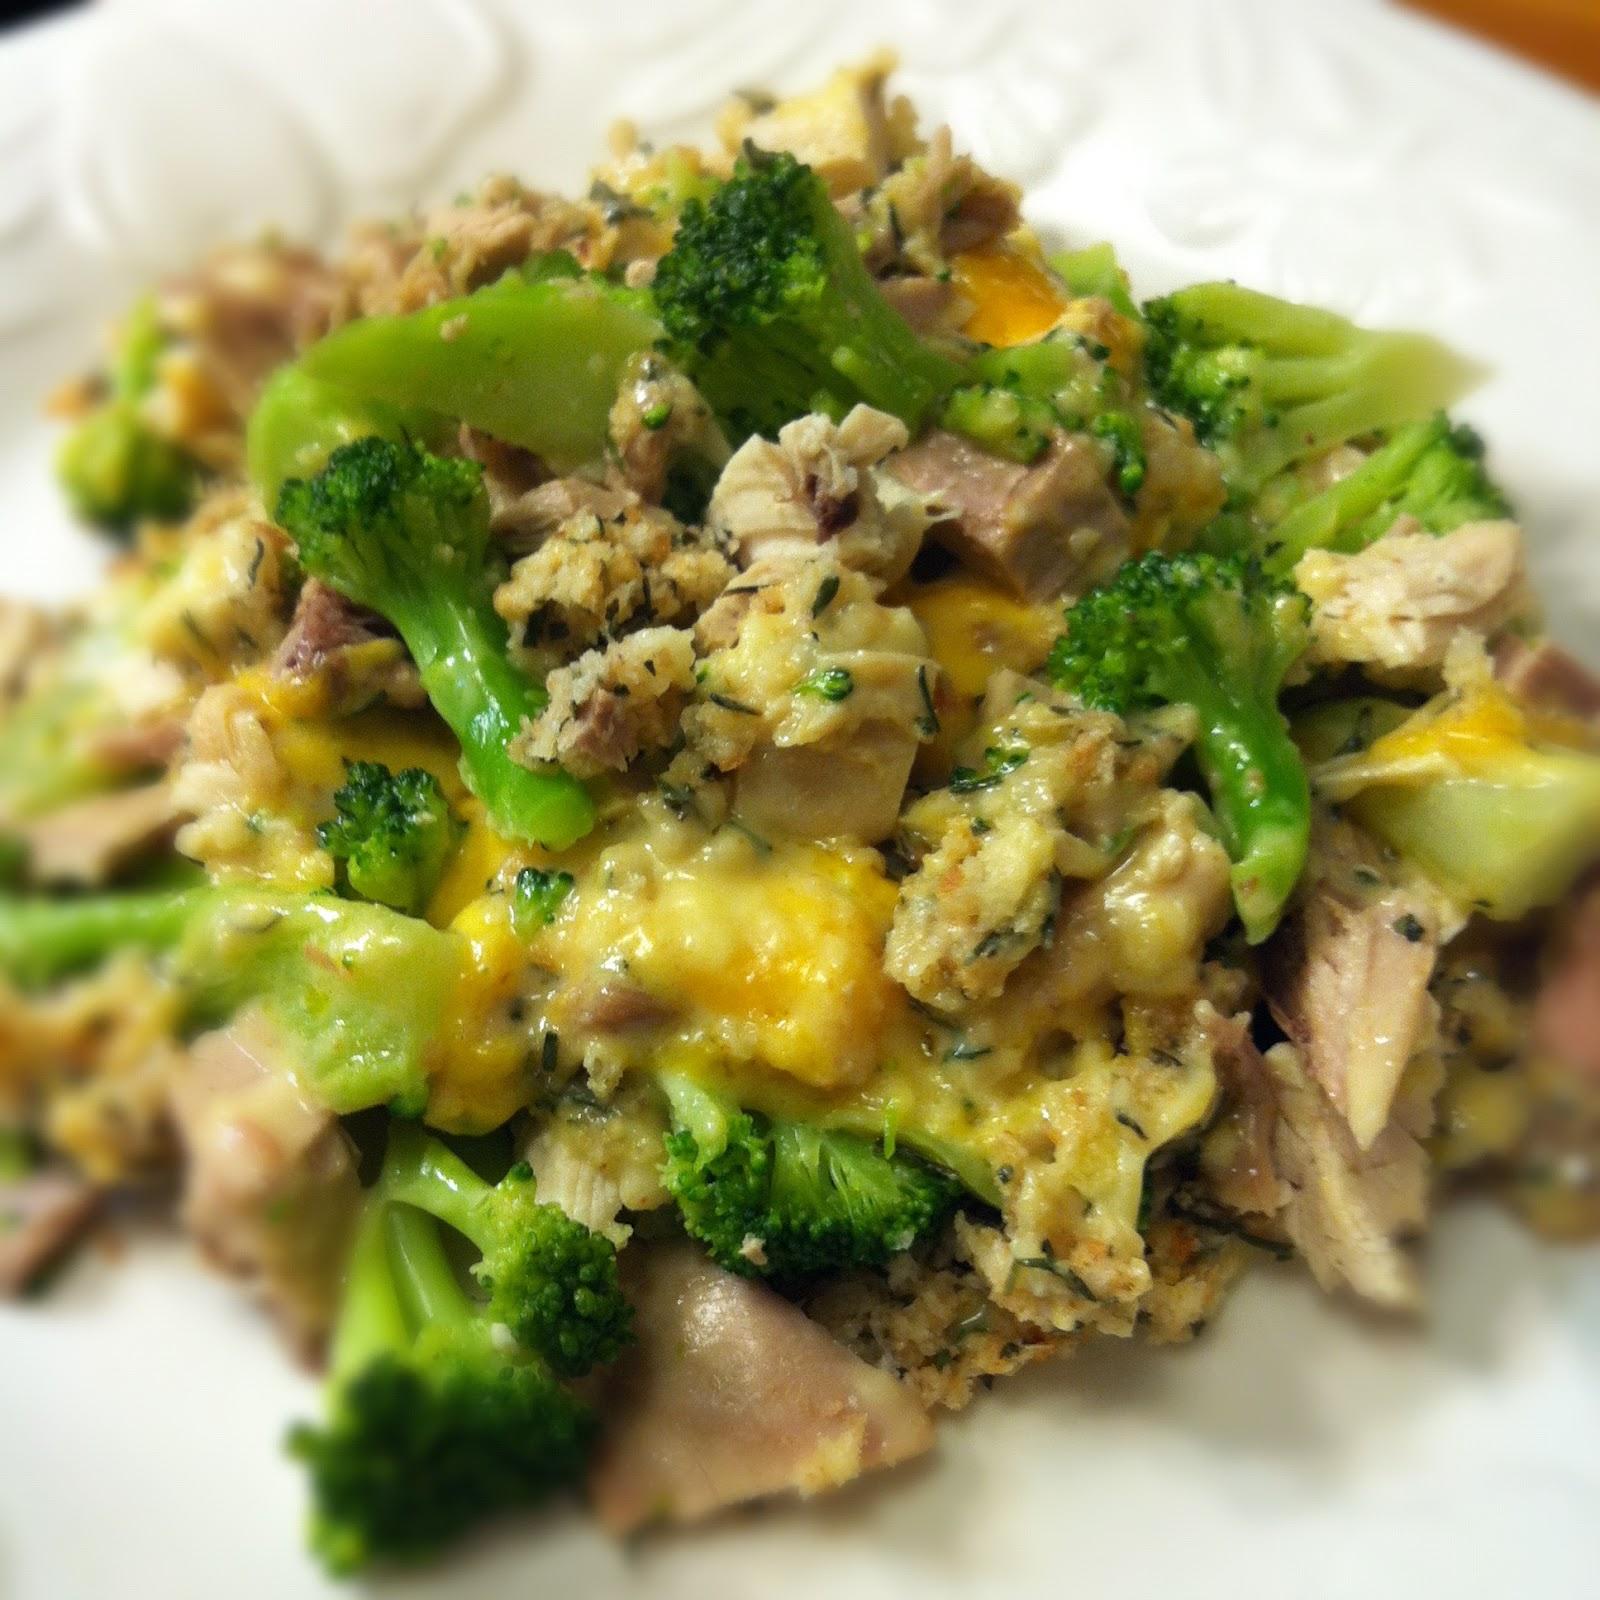 My Food Infatuation: Turkey Casserole